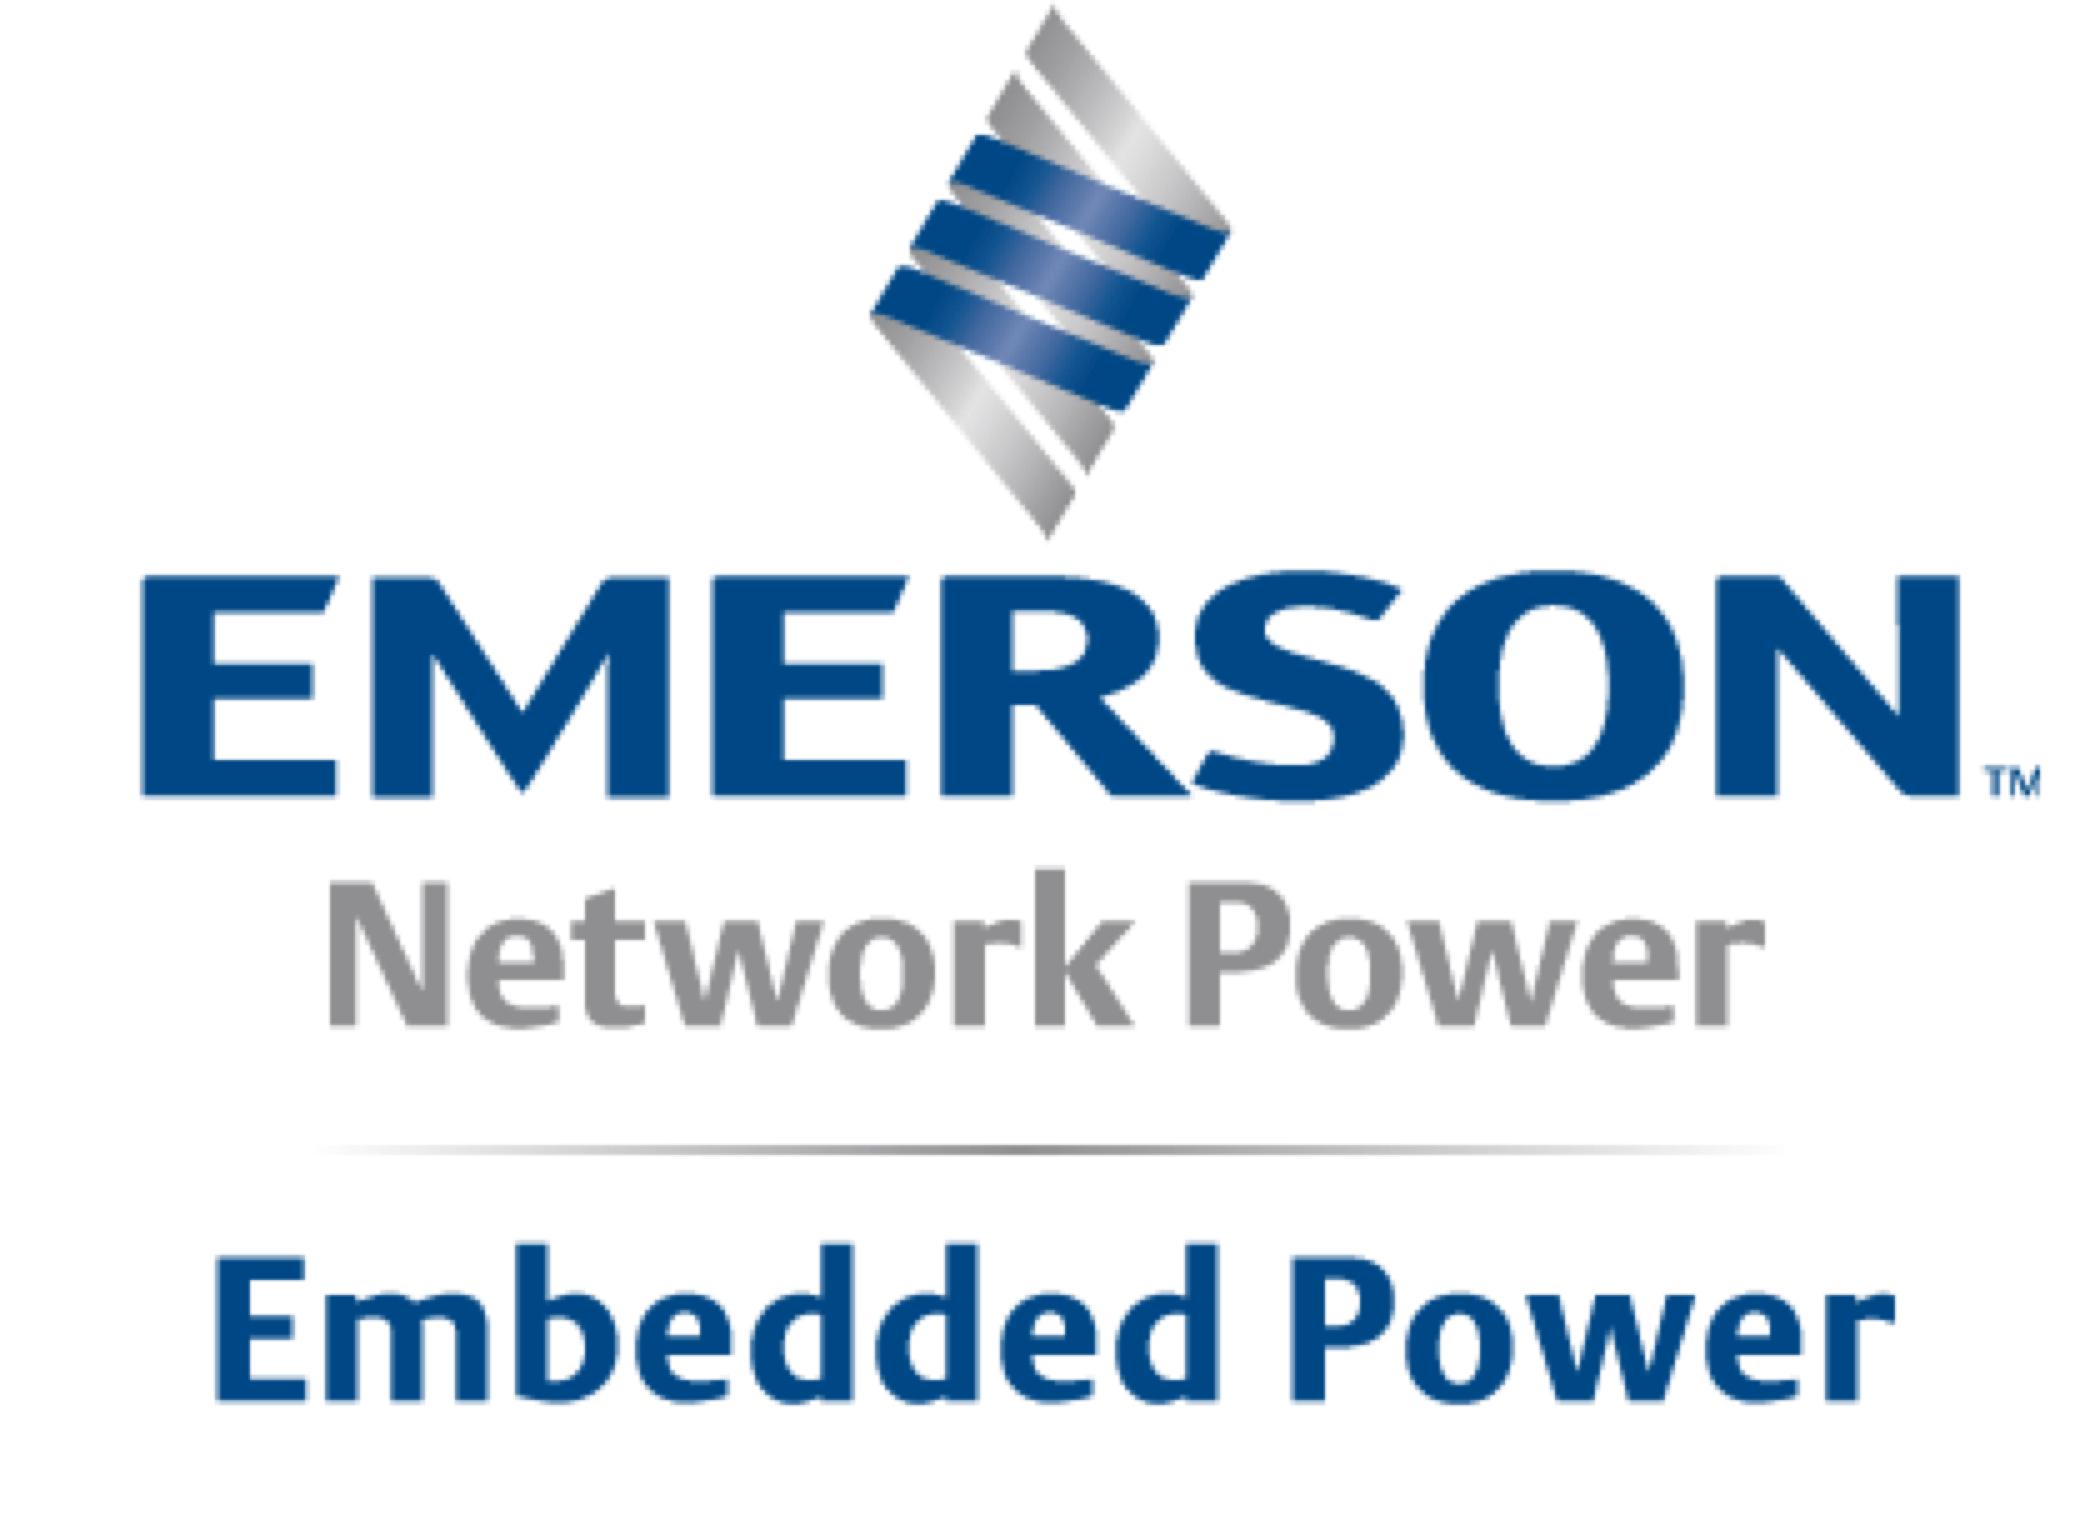 Emerson-LGA-Power-Supplies-Website-Design-Logo